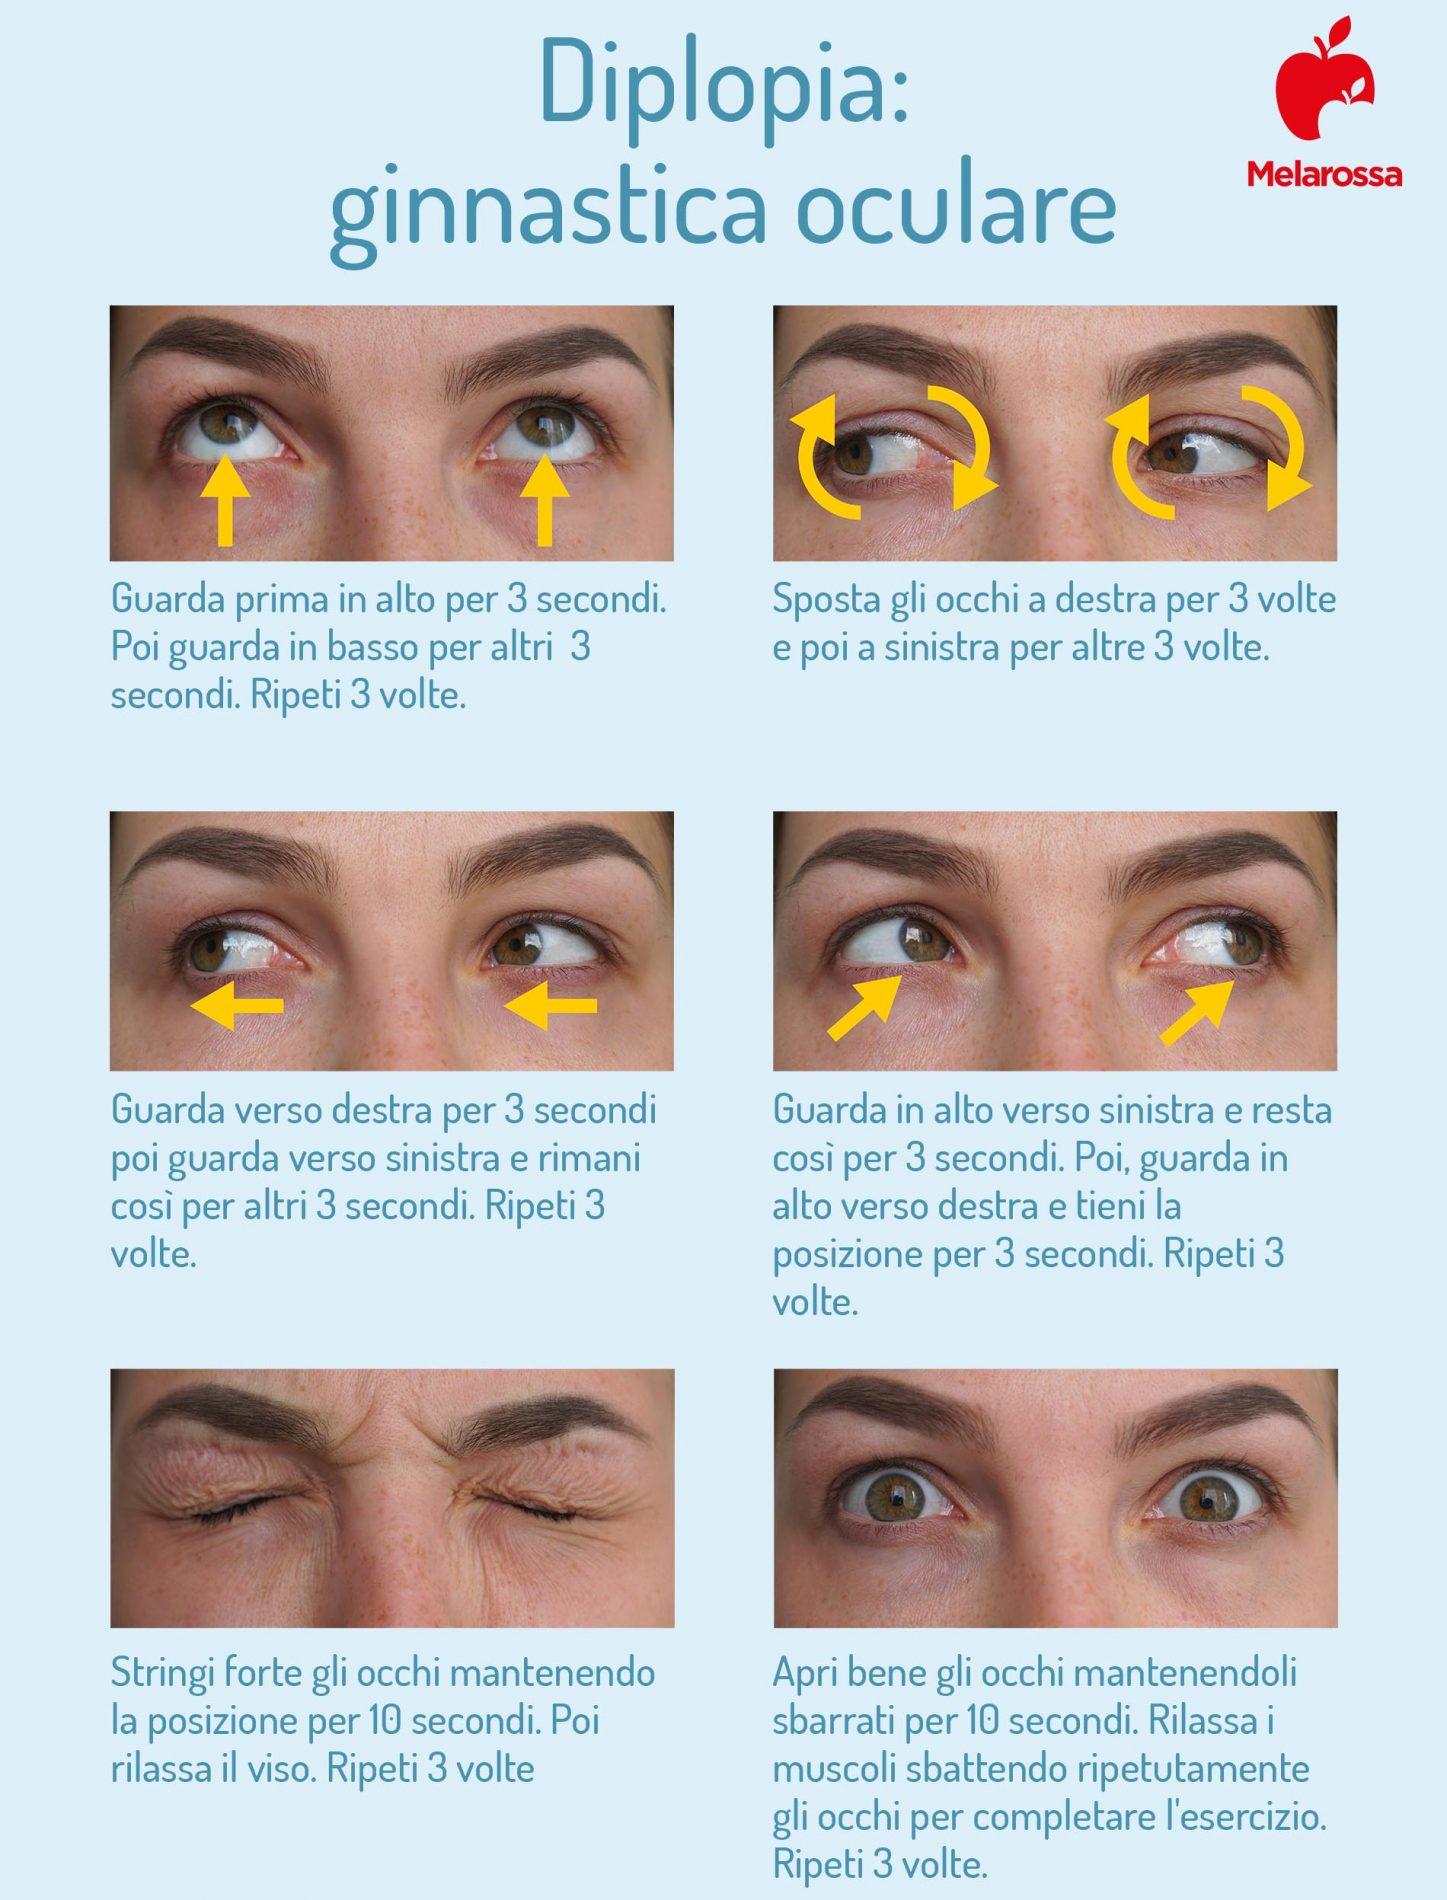 diplopia: ginnastica oculare